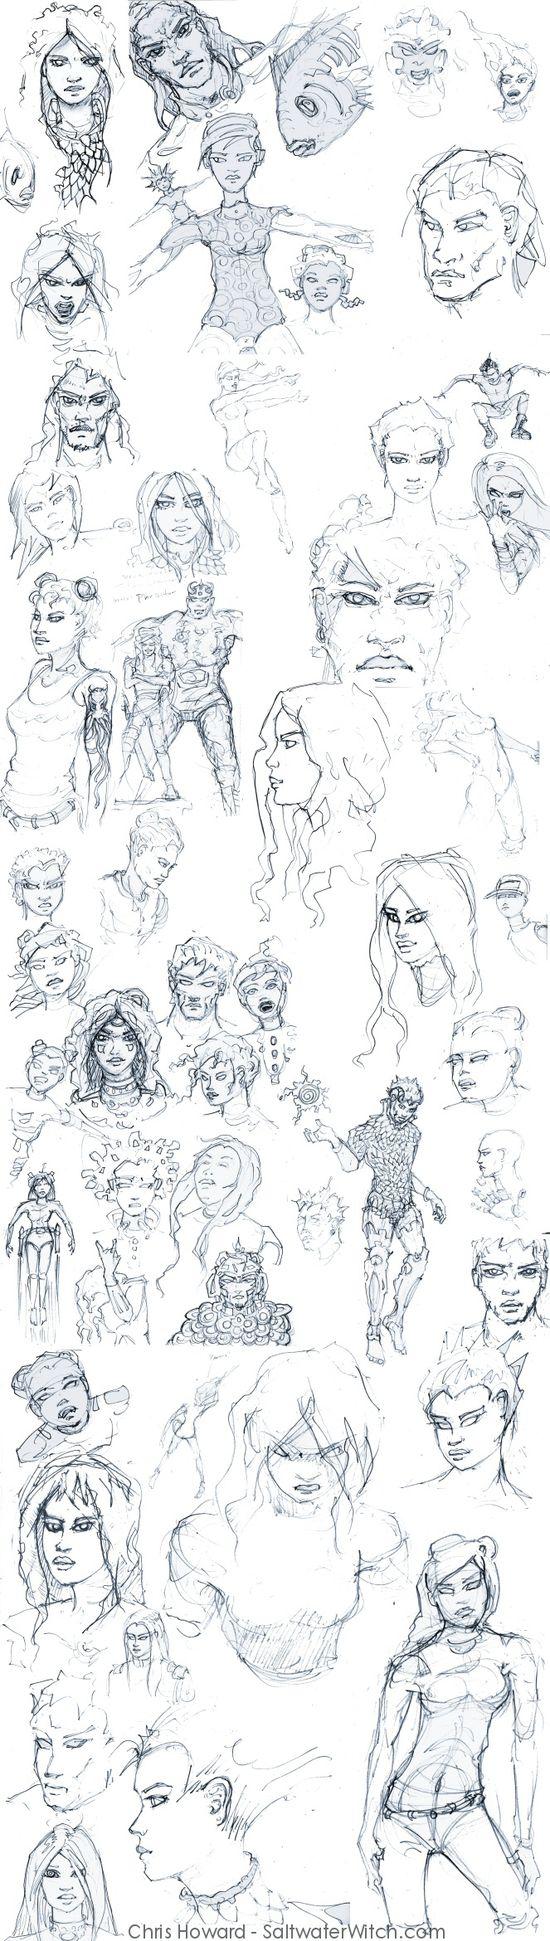 SketchingChrisHoward20120527